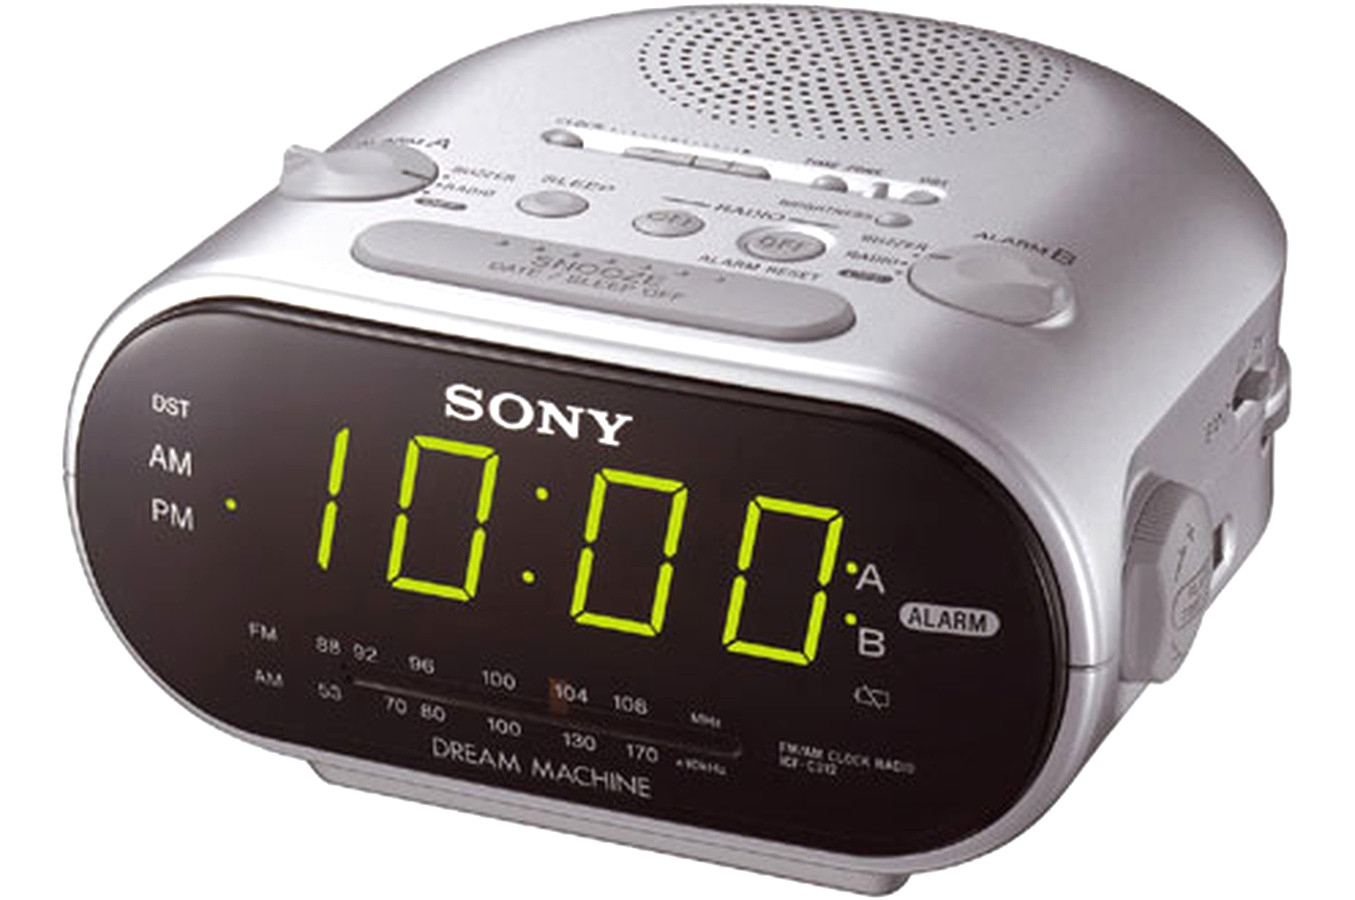 Radio Reveil Philips Darty Meilleur De Images Bigben Interactive Rrse3 Uhr Digital Schwarz Radio Ebay Avec S L1600